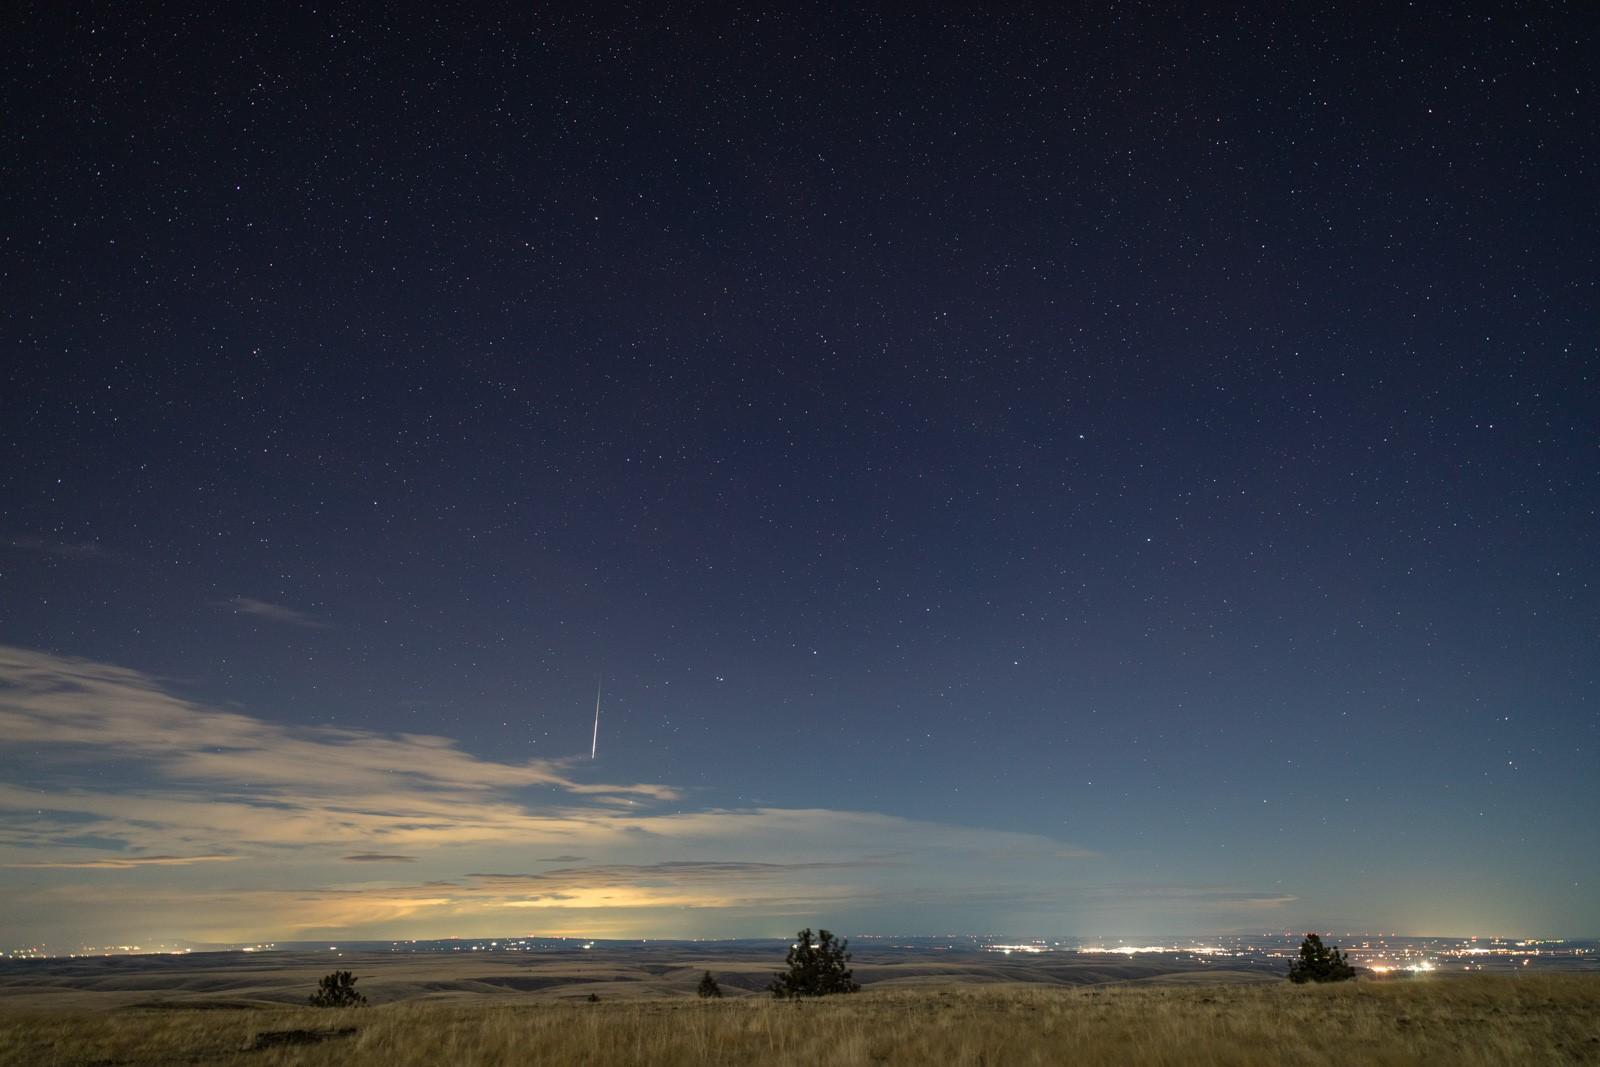 Meteor Shower 2022 Calendar.Meteor Activity Outlook For December 26 2020 January 1 2021 American Meteor Society